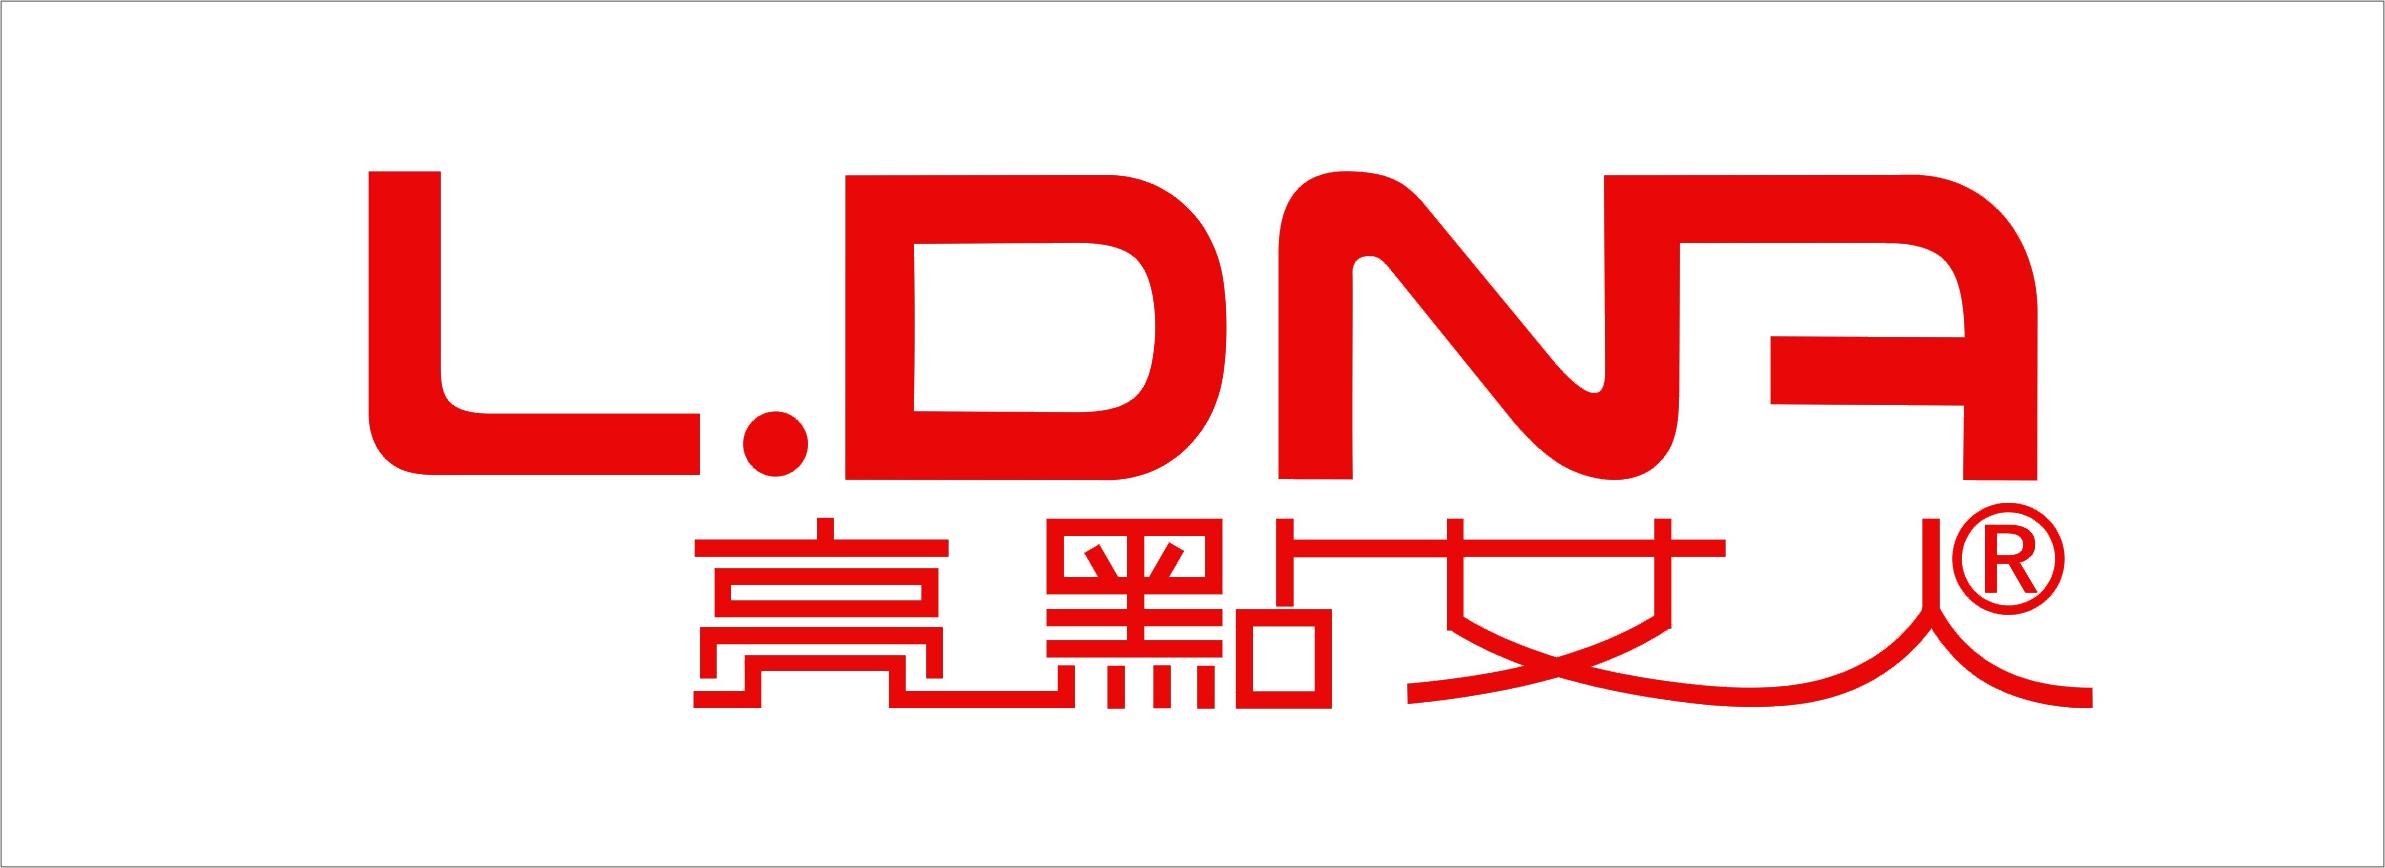 logo logo 标识 标志 设计 矢量 矢量图 素材 图标 2385_868